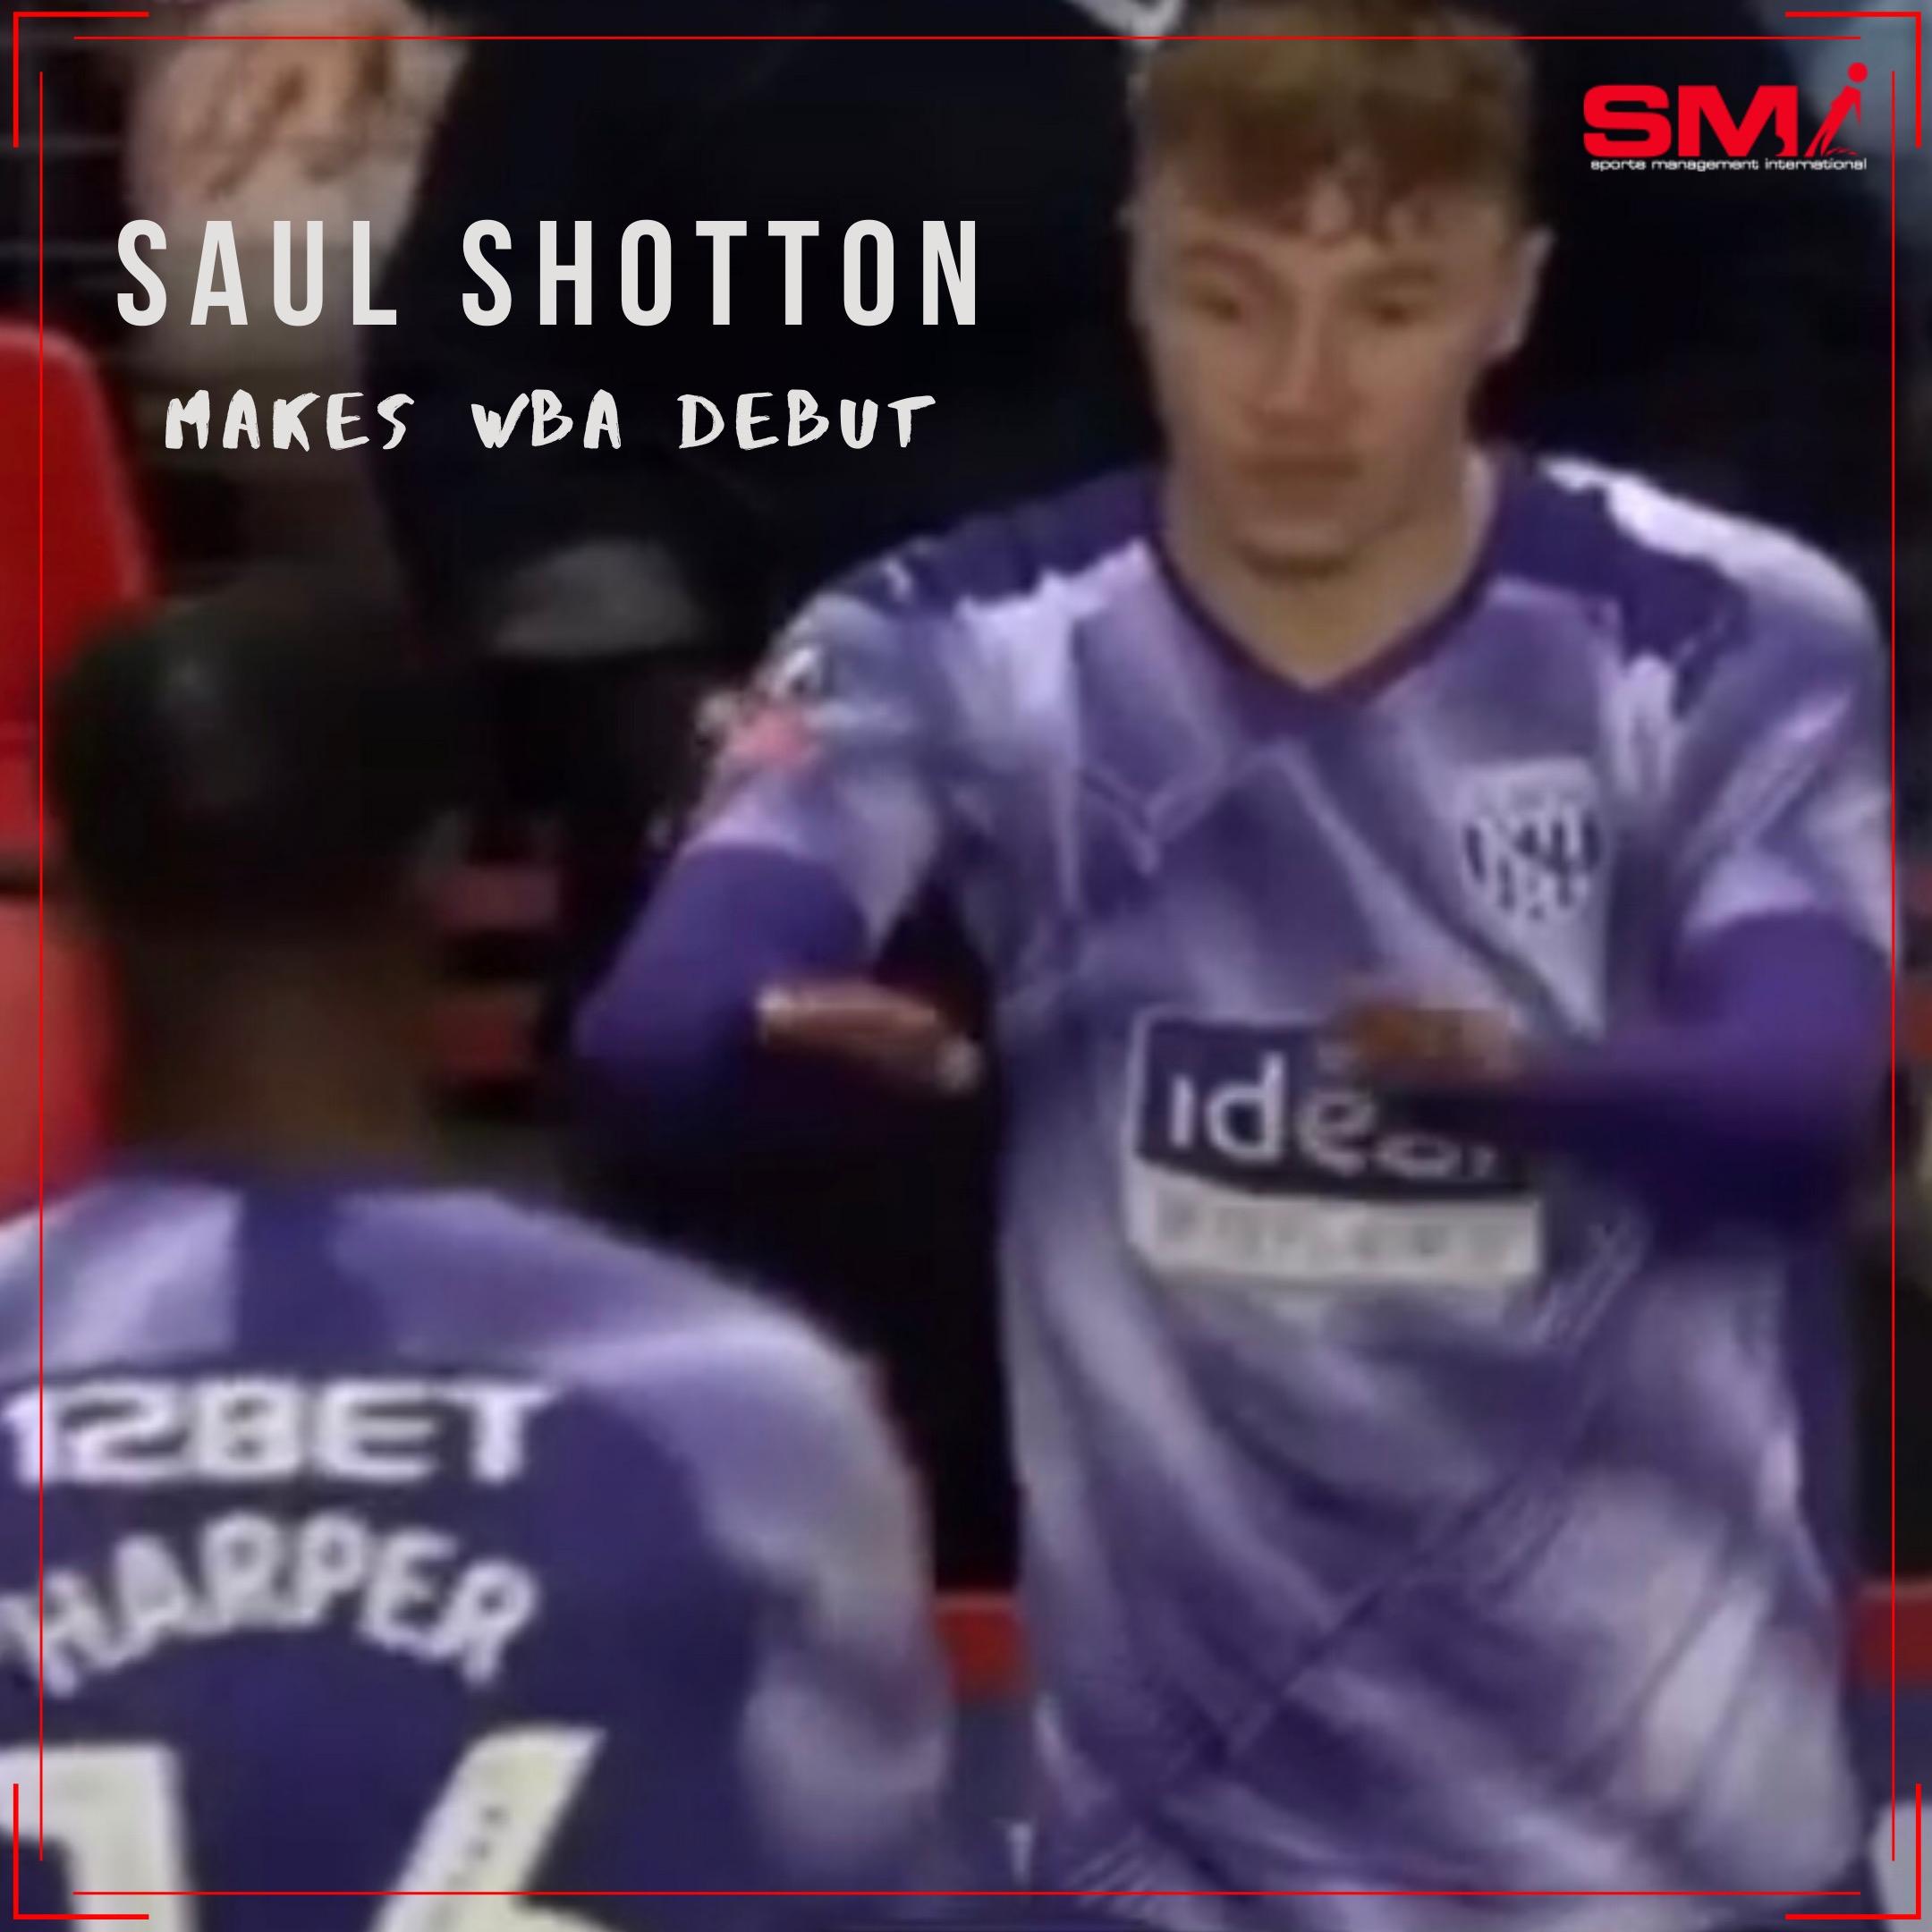 Saul Shotton makes his WBA debut